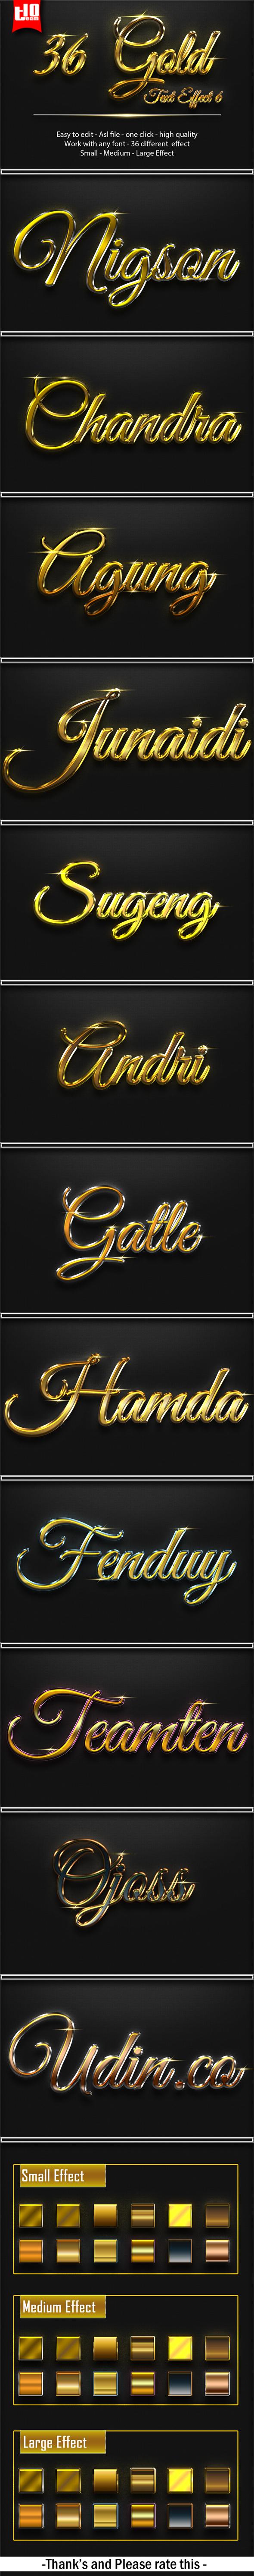 36 Gold Effect 6